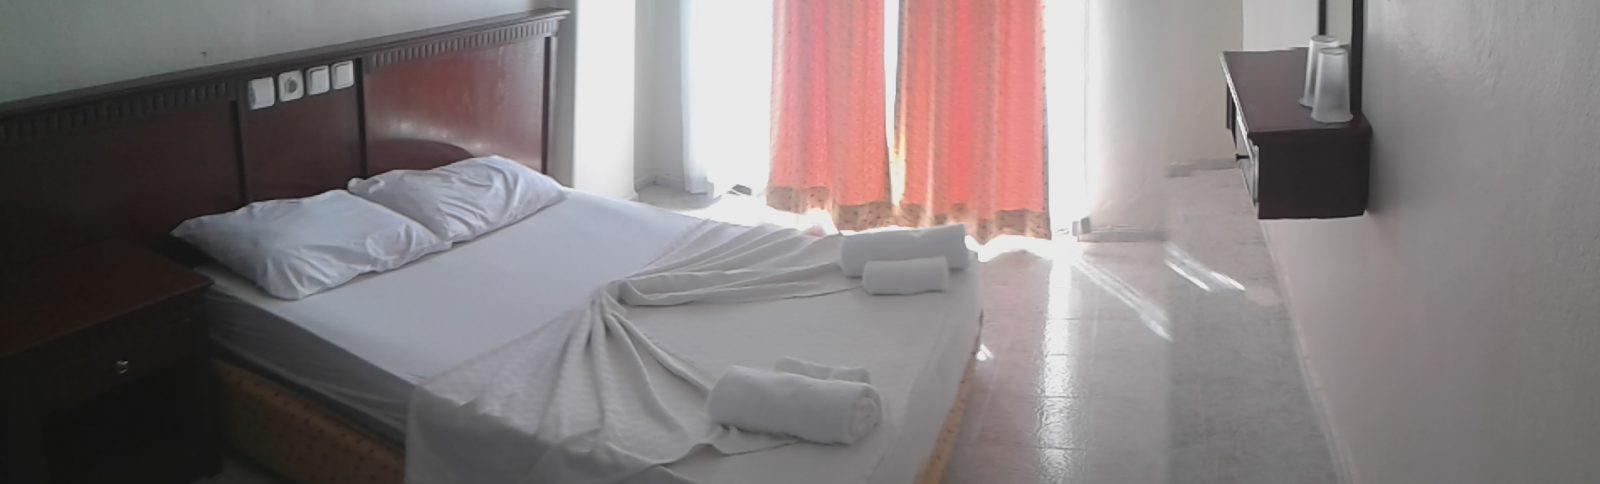 Letovanje Turska autobusom, Kusadasi, Hotel Tecimen,dvokrevetna soba